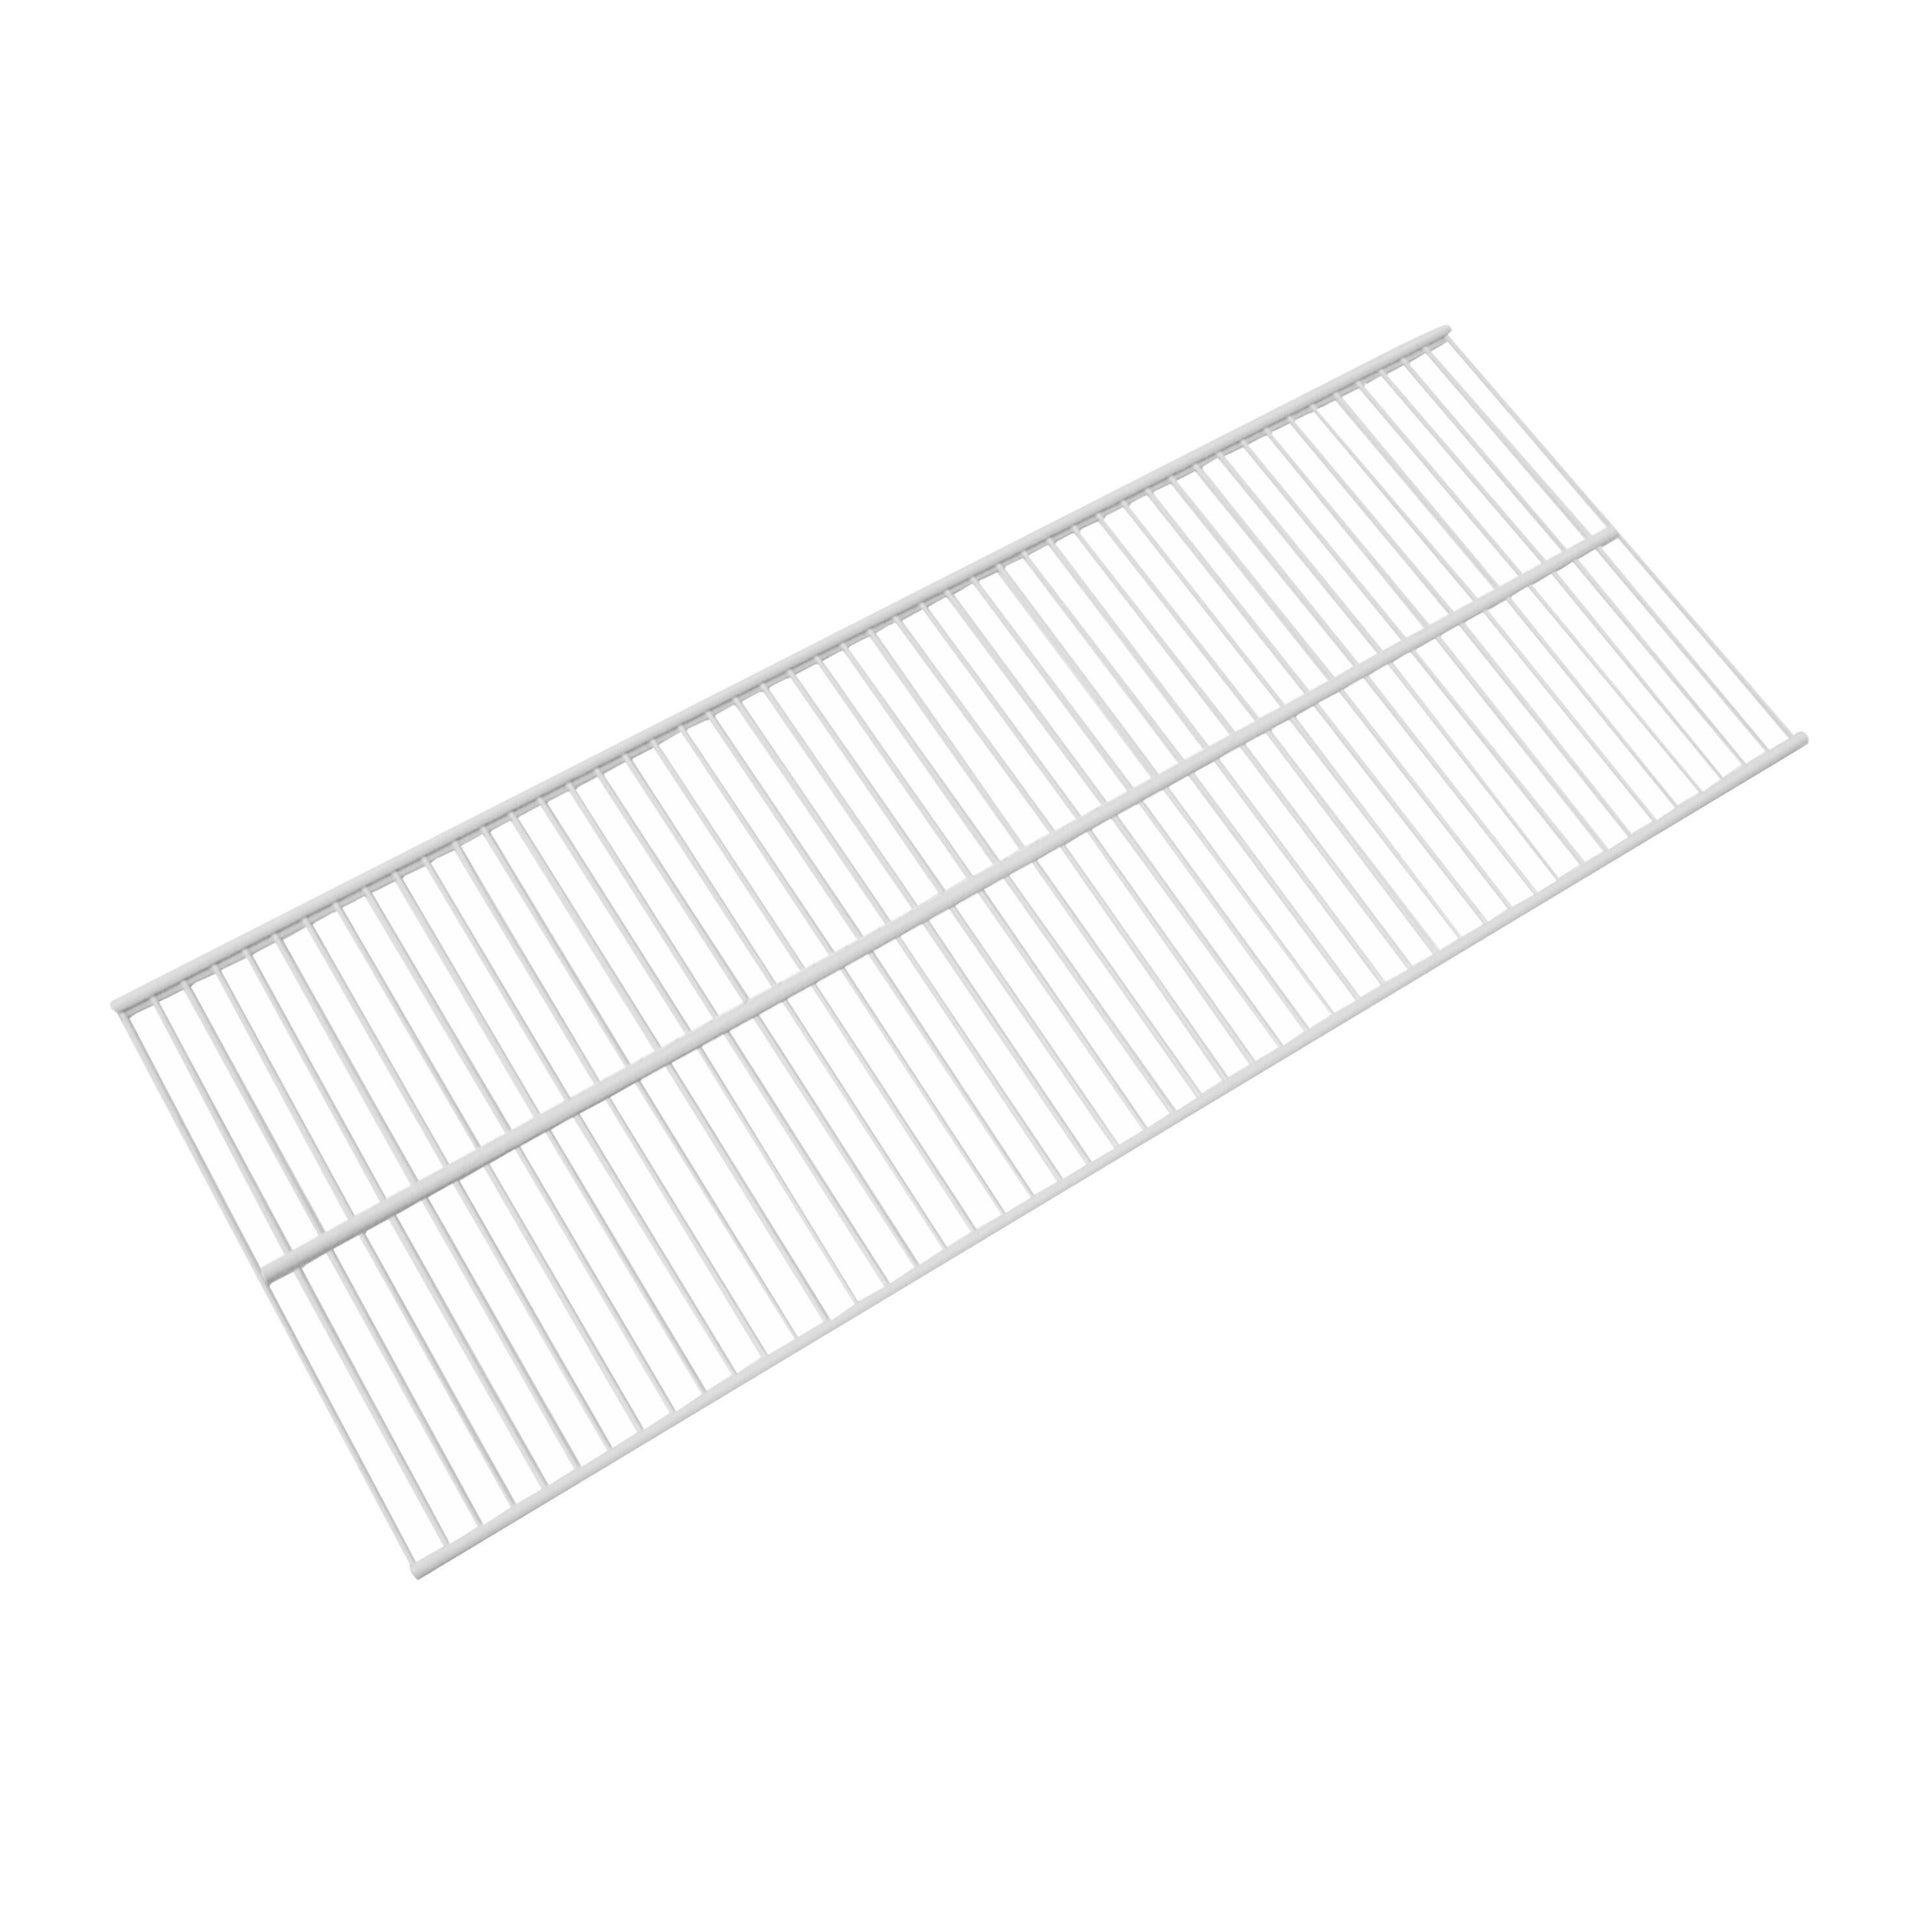 Reggimensola Spaceo L 80.0 x H 30.0 x P 30.0 cm bianco - 5